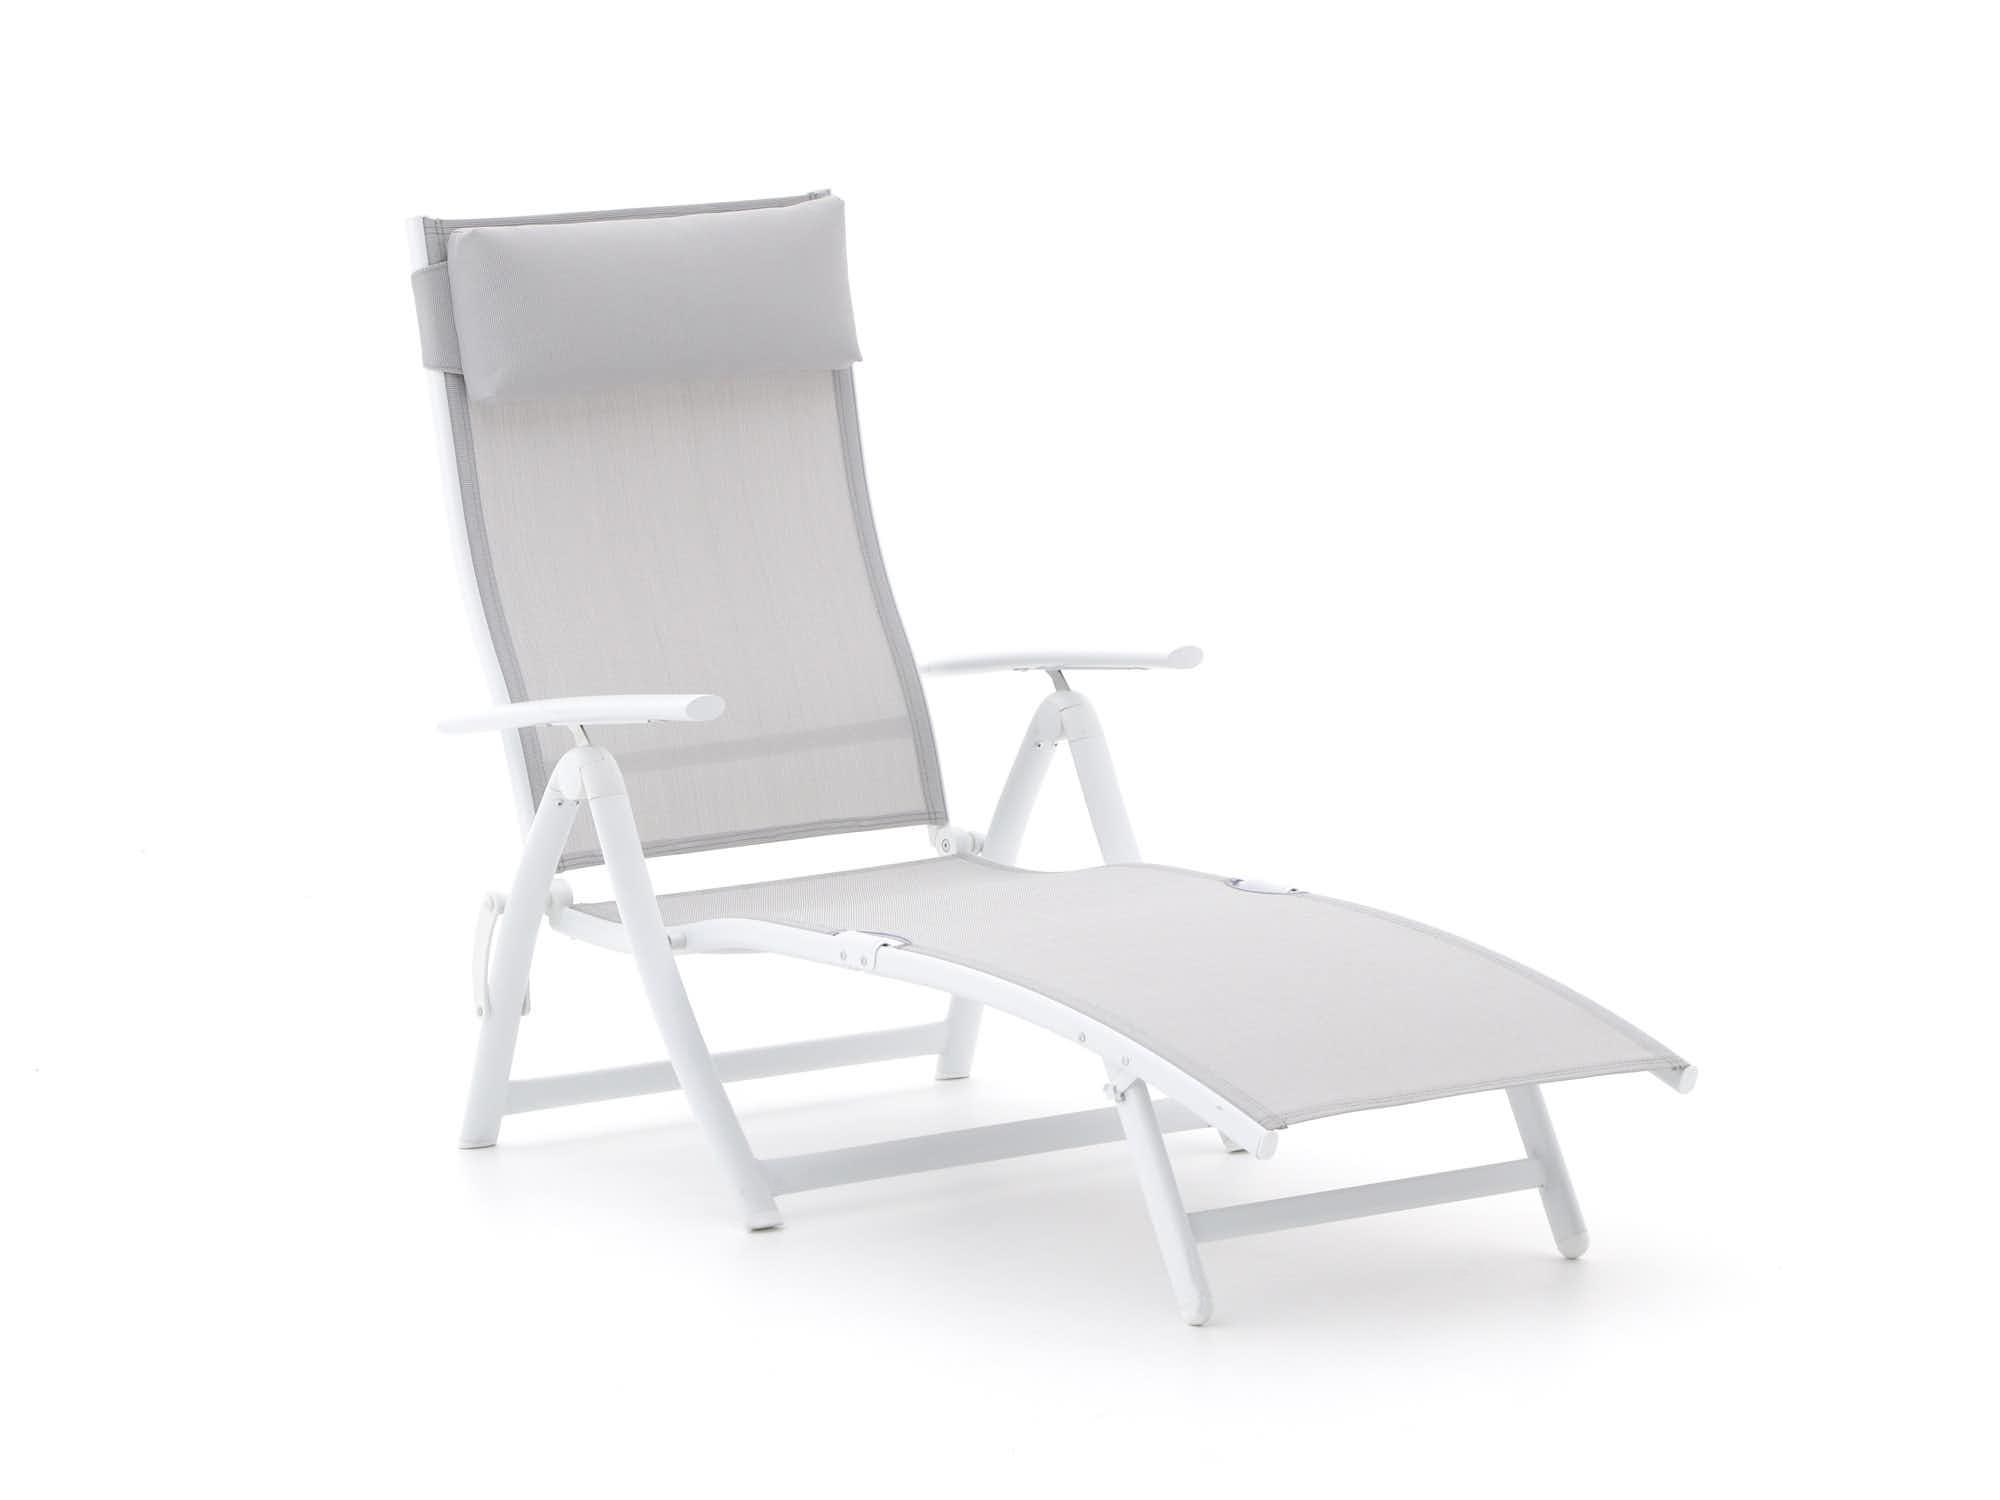 RS Design Capri ligbed